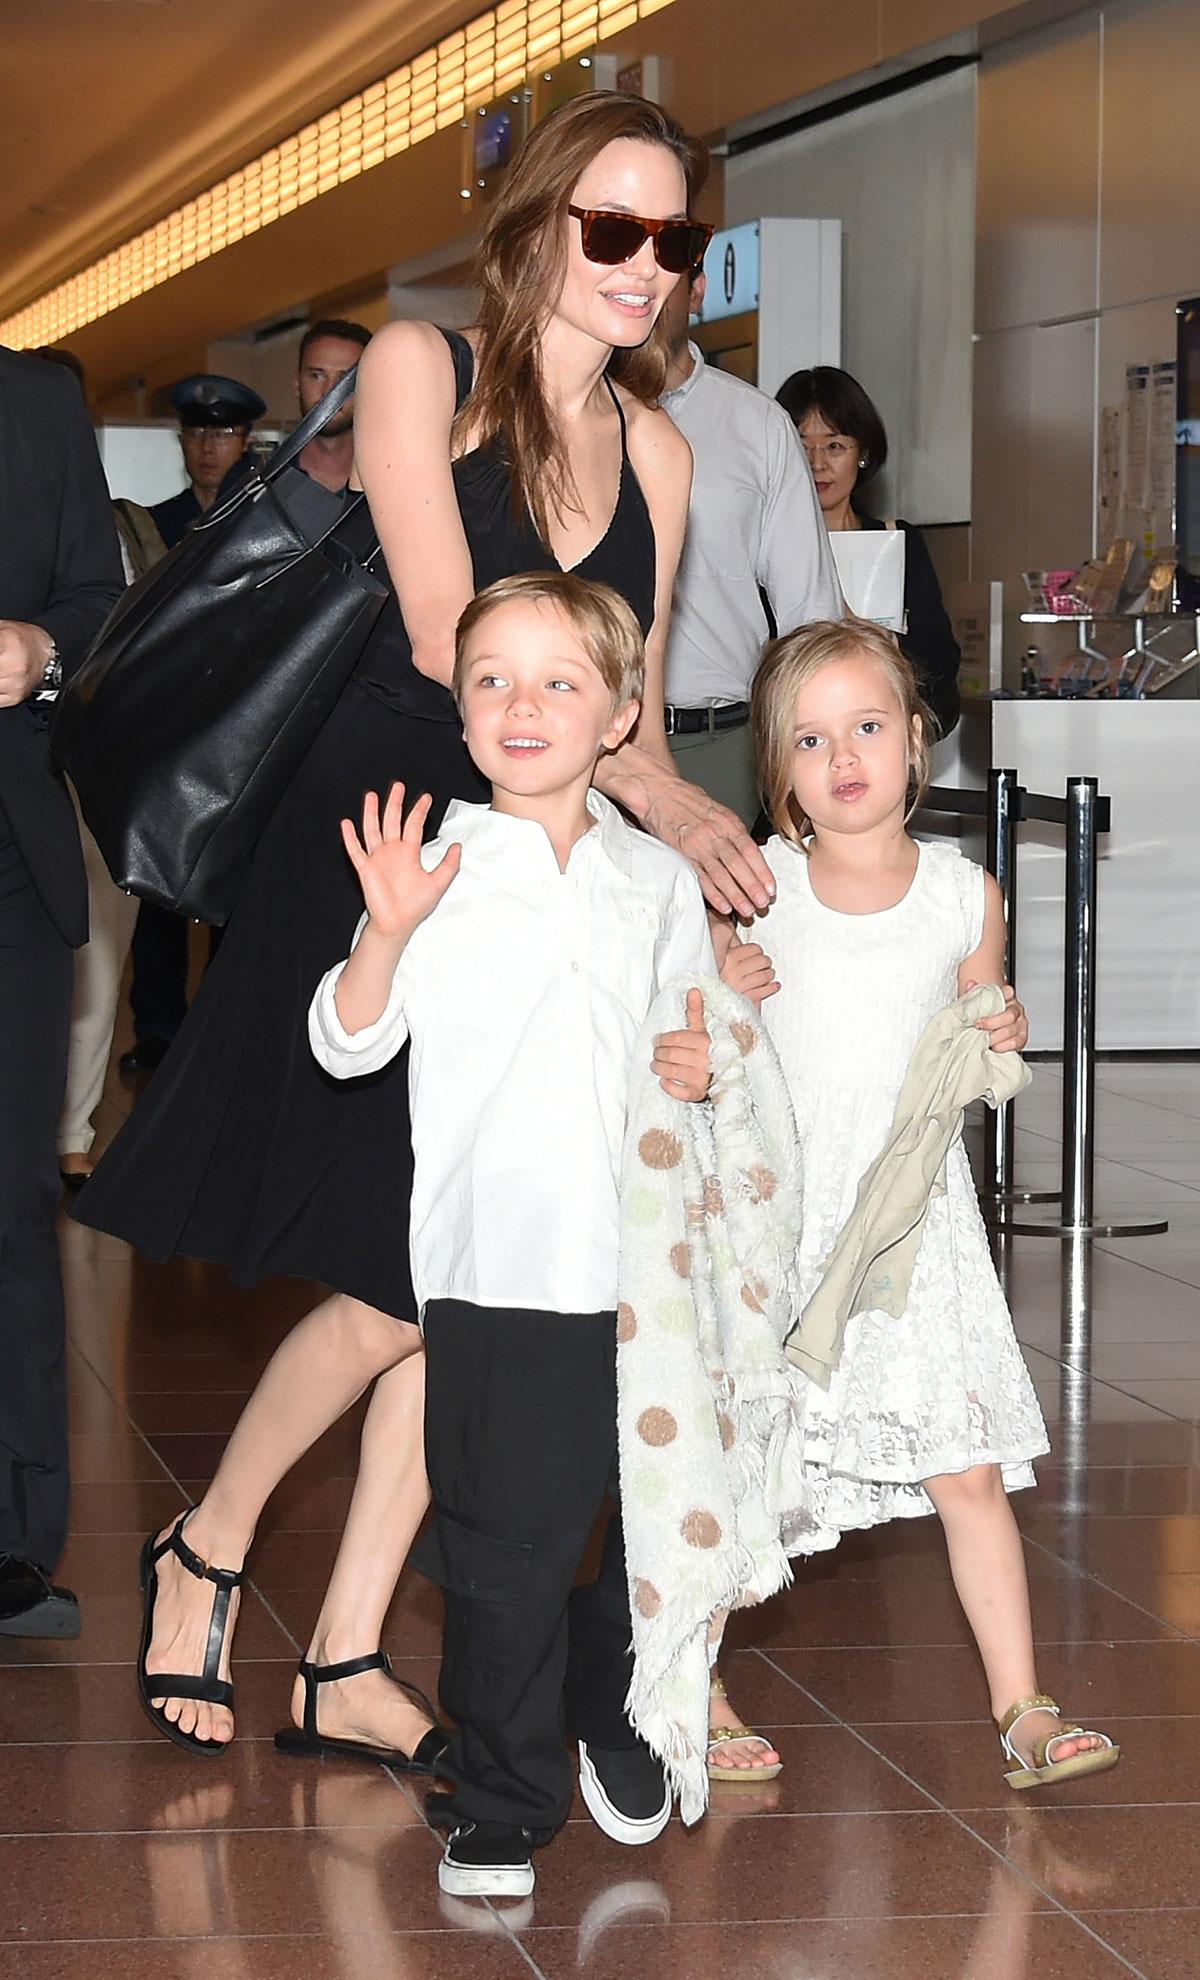 Knox Jolie-Pitt, Angelina Jolie and Vivienne Jolie-Pitt are seen upon arrival at Haneda Airport on June 21, 2014 in Tokyo, Japan